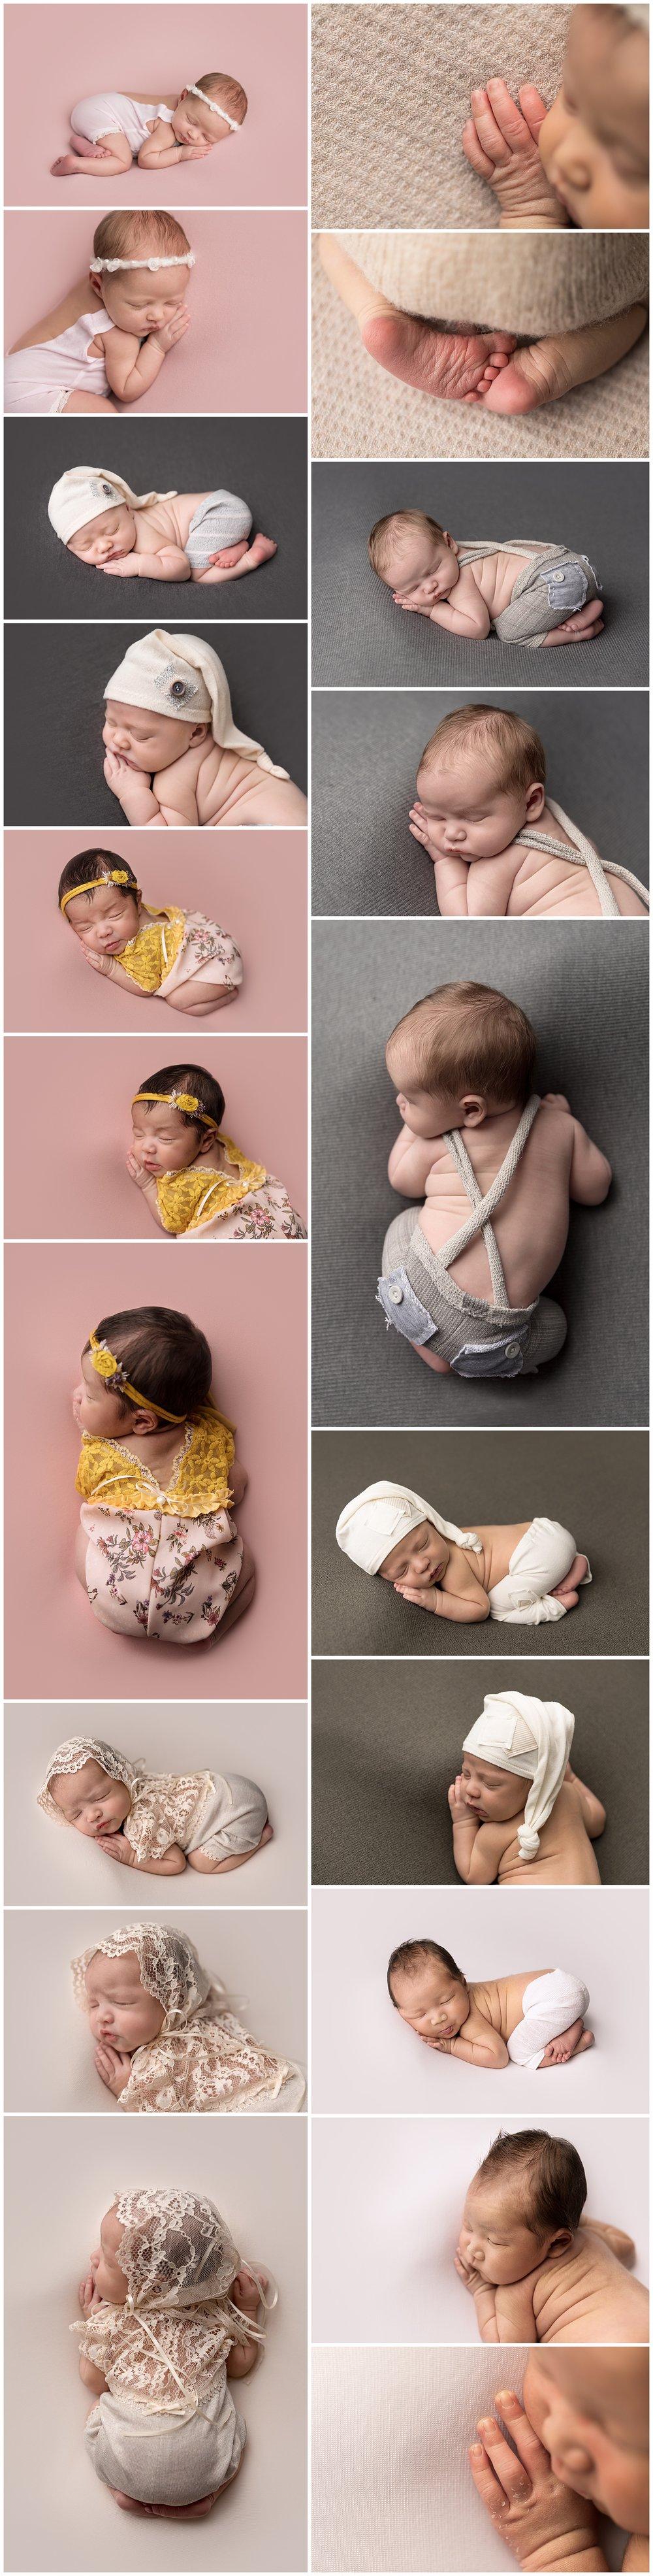 bum tushy up newborn beanbag pose